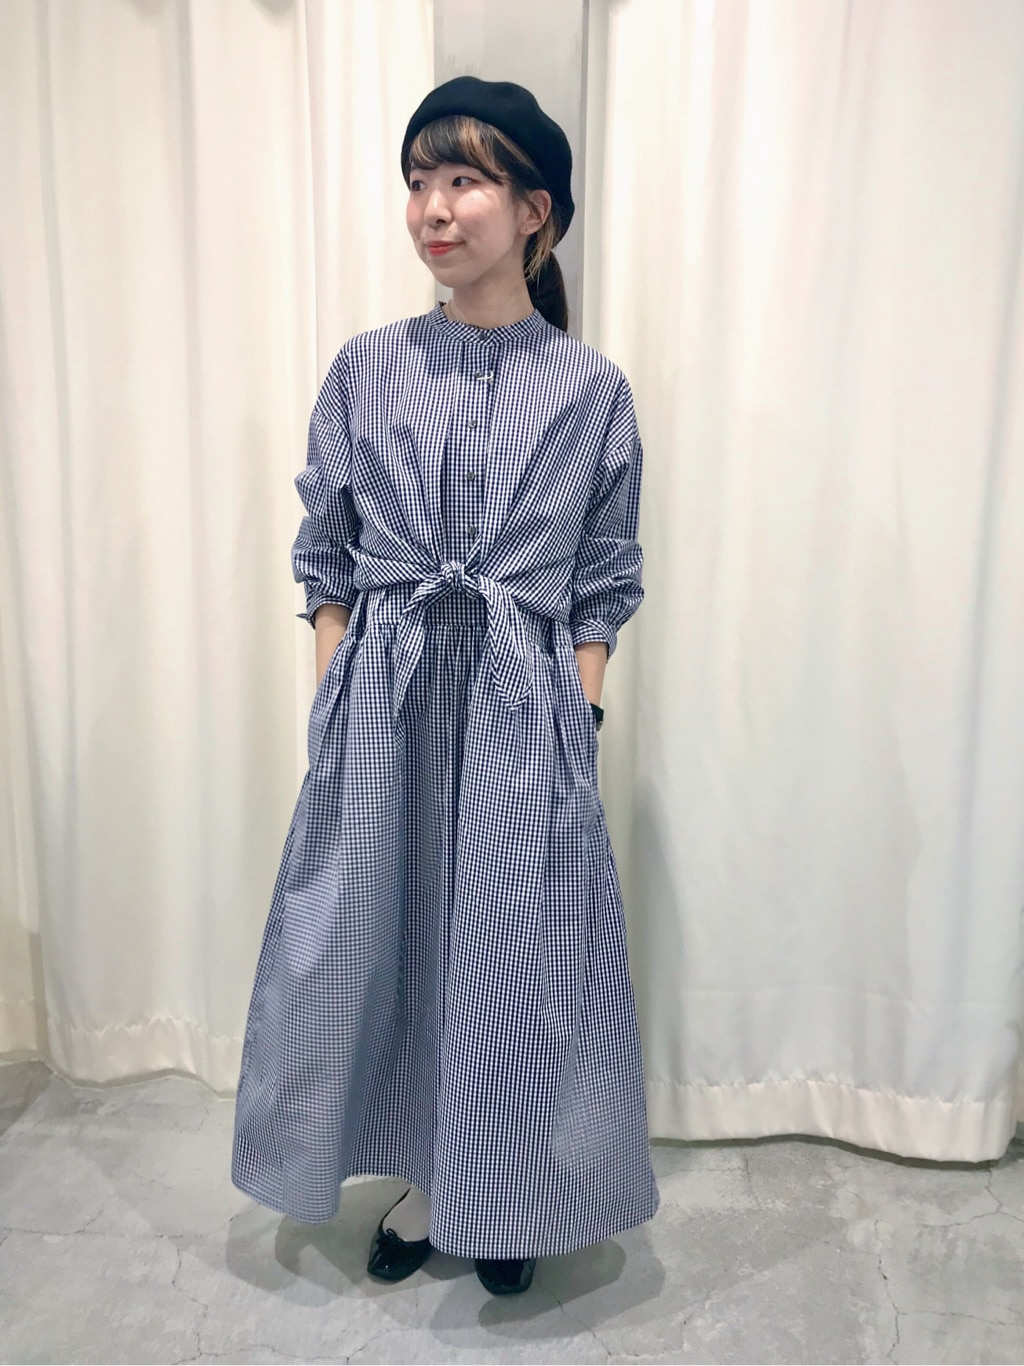 - PAR ICI CHILD WOMAN , PAR ICI 東京スカイツリータウン・ソラマチ 身長:154cm 2020.09.02